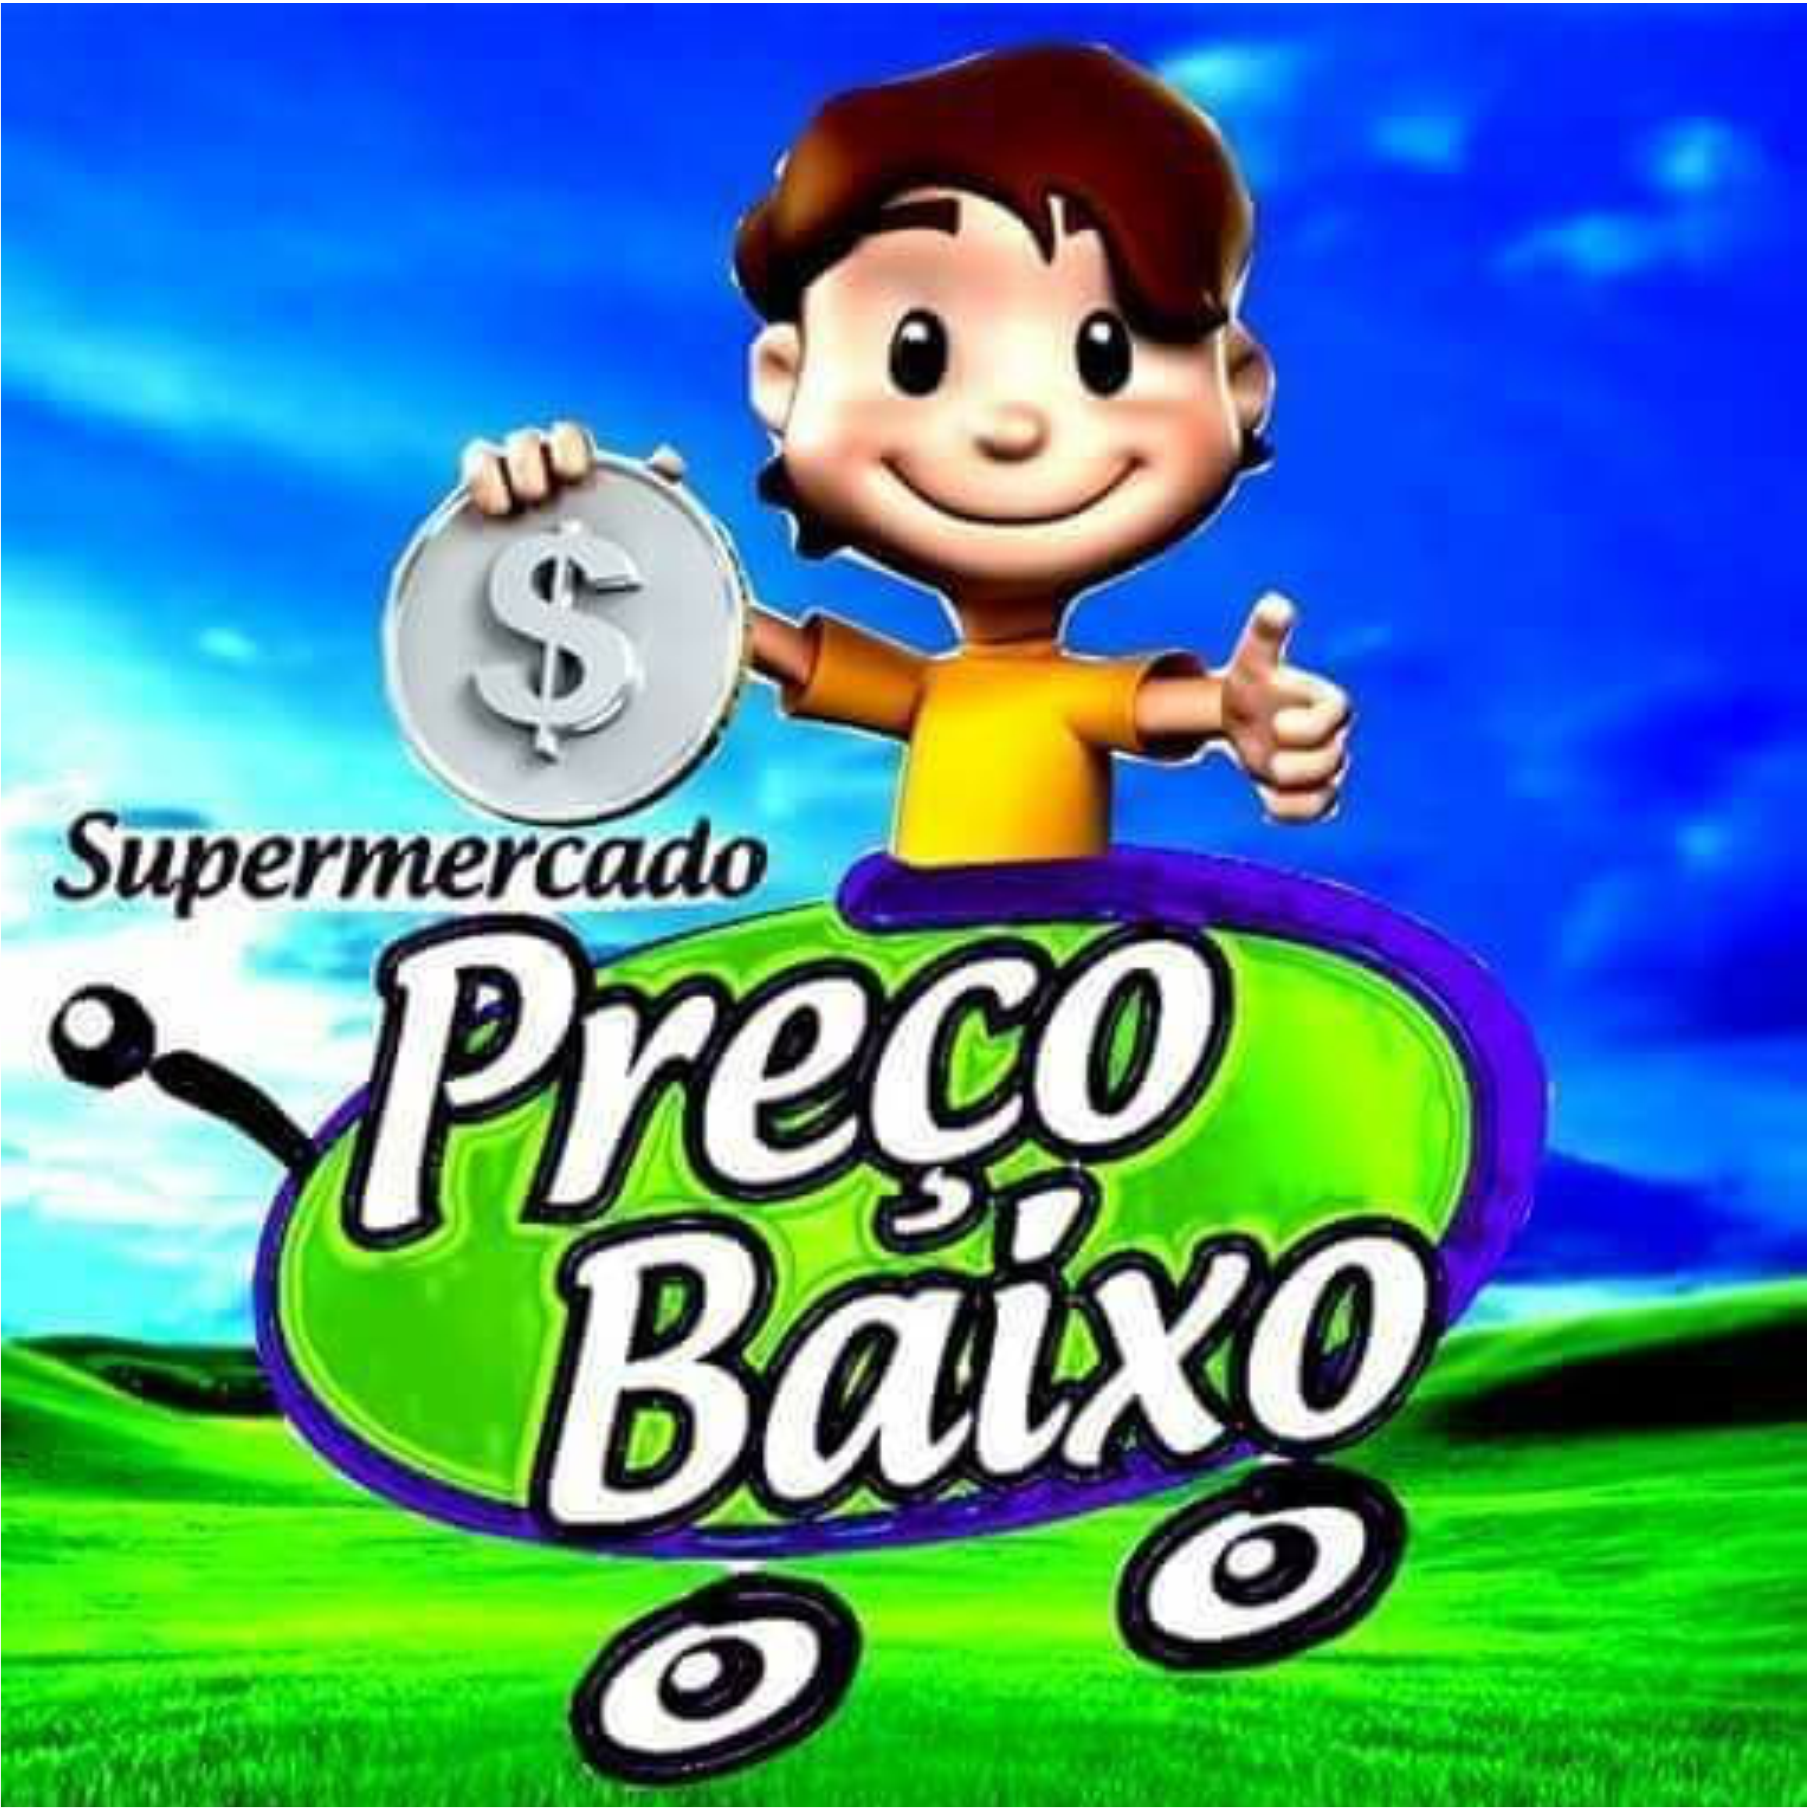 Supermercado Preço Baixo Gravatá